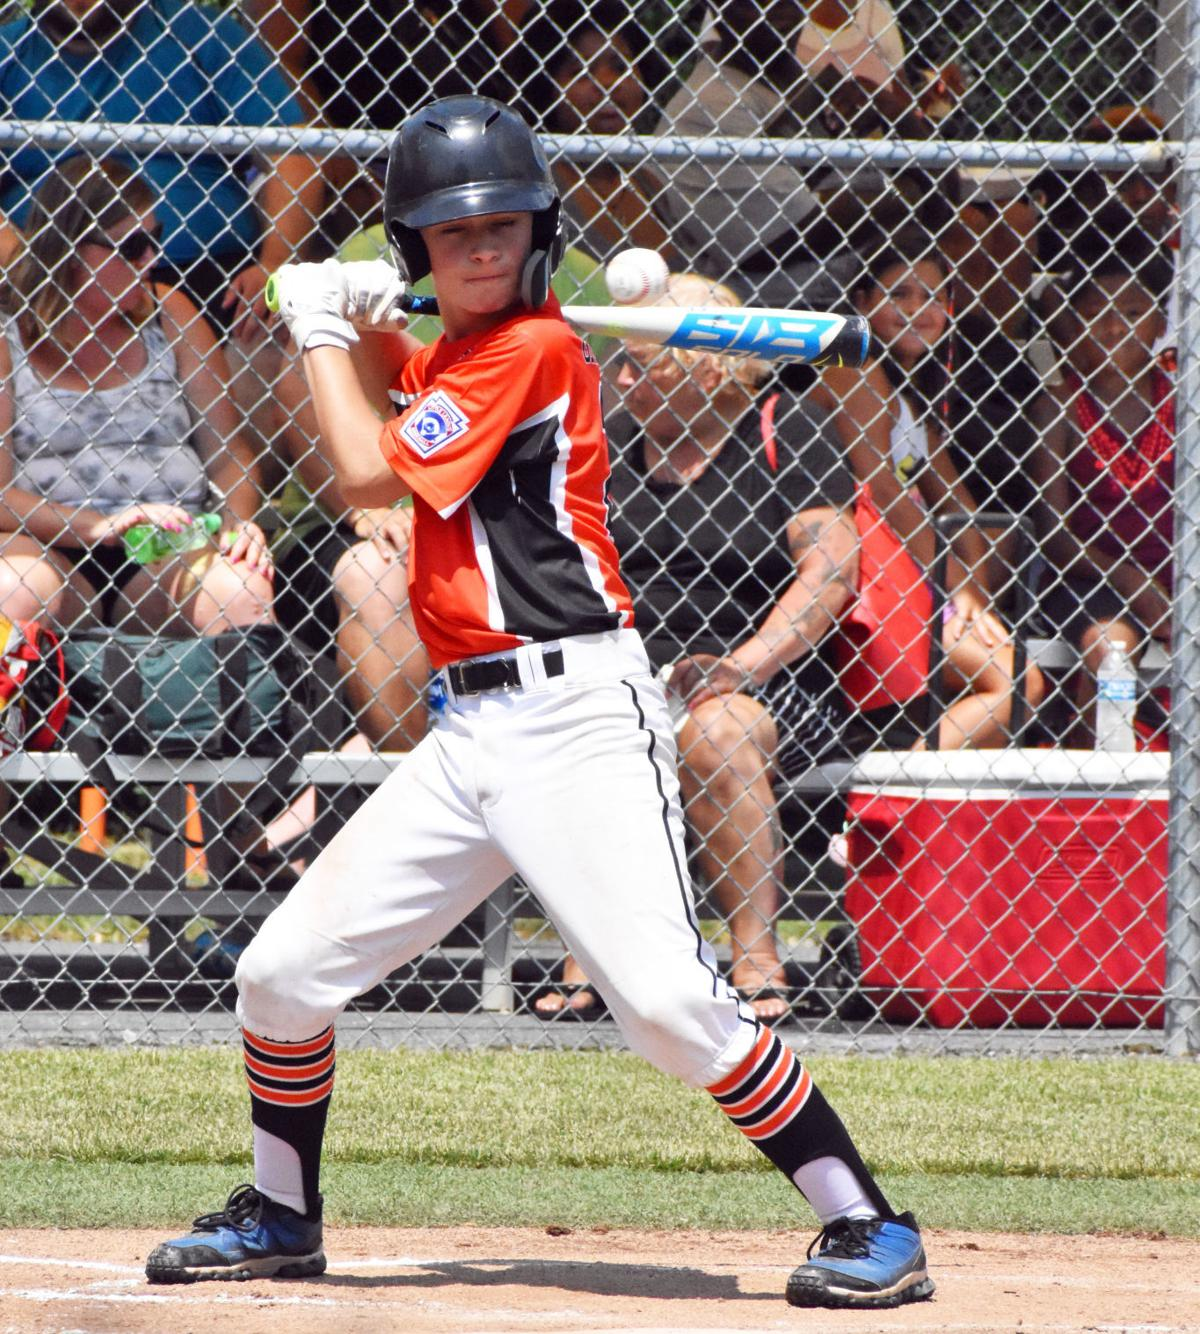 State 11-12 Little League Baseball Playoffs: Easton vs. Frederick, July 26, 2019